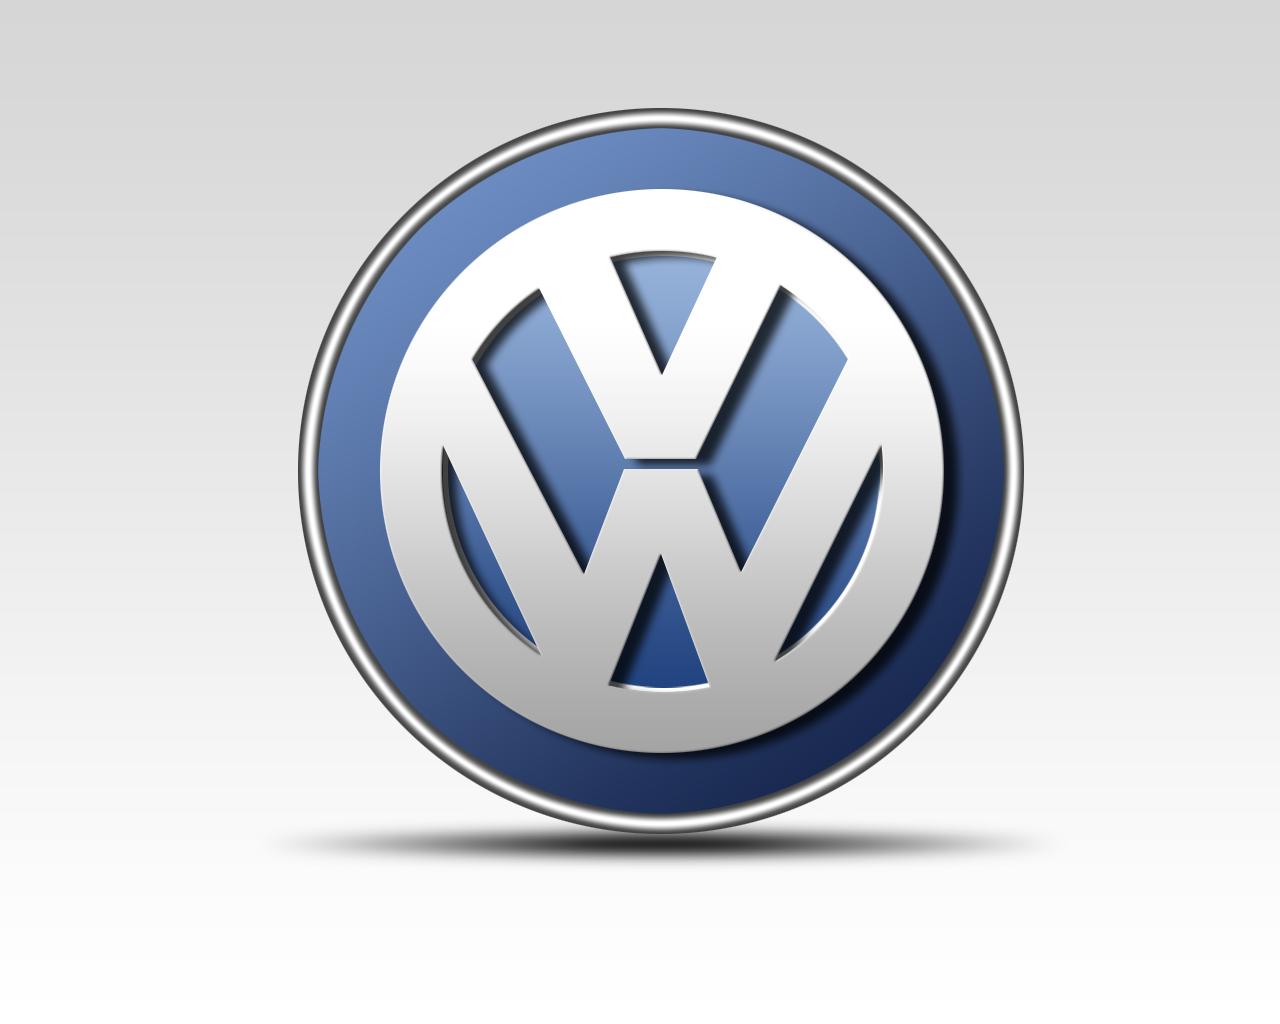 volkswagen logo 2013 geneva motor show